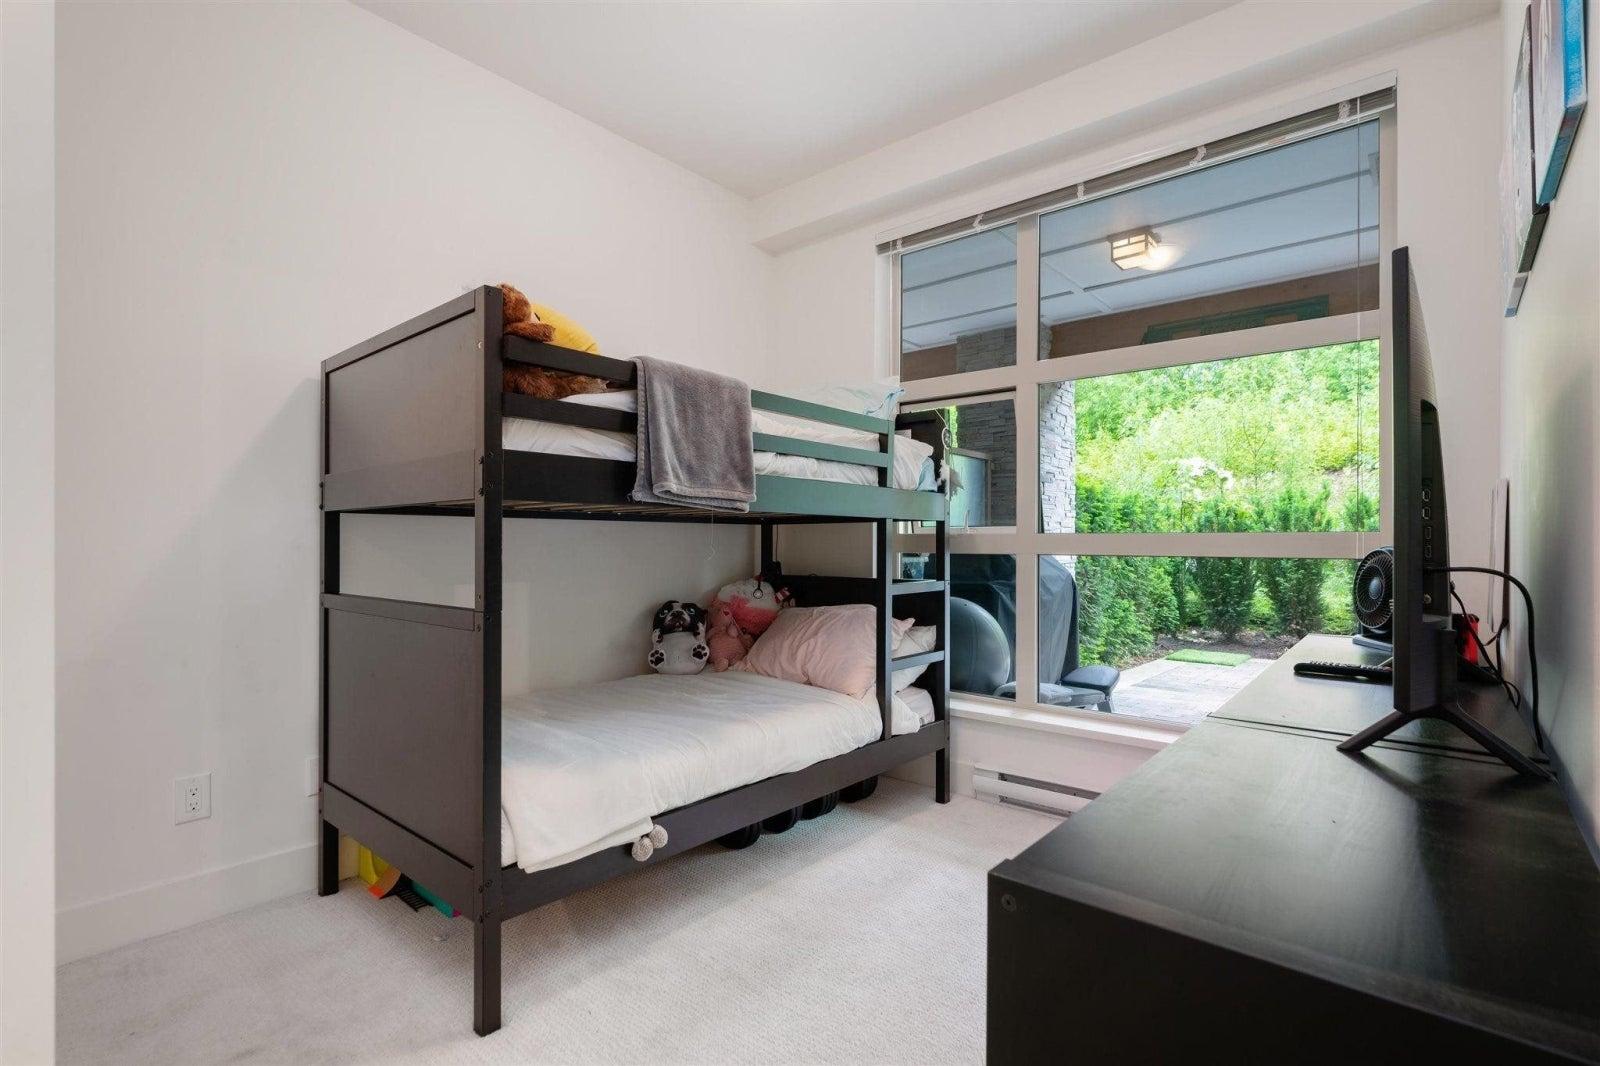 222 3602 ALDERCREST DRIVE - Roche Point Apartment/Condo for sale, 2 Bedrooms (R2603975) #13